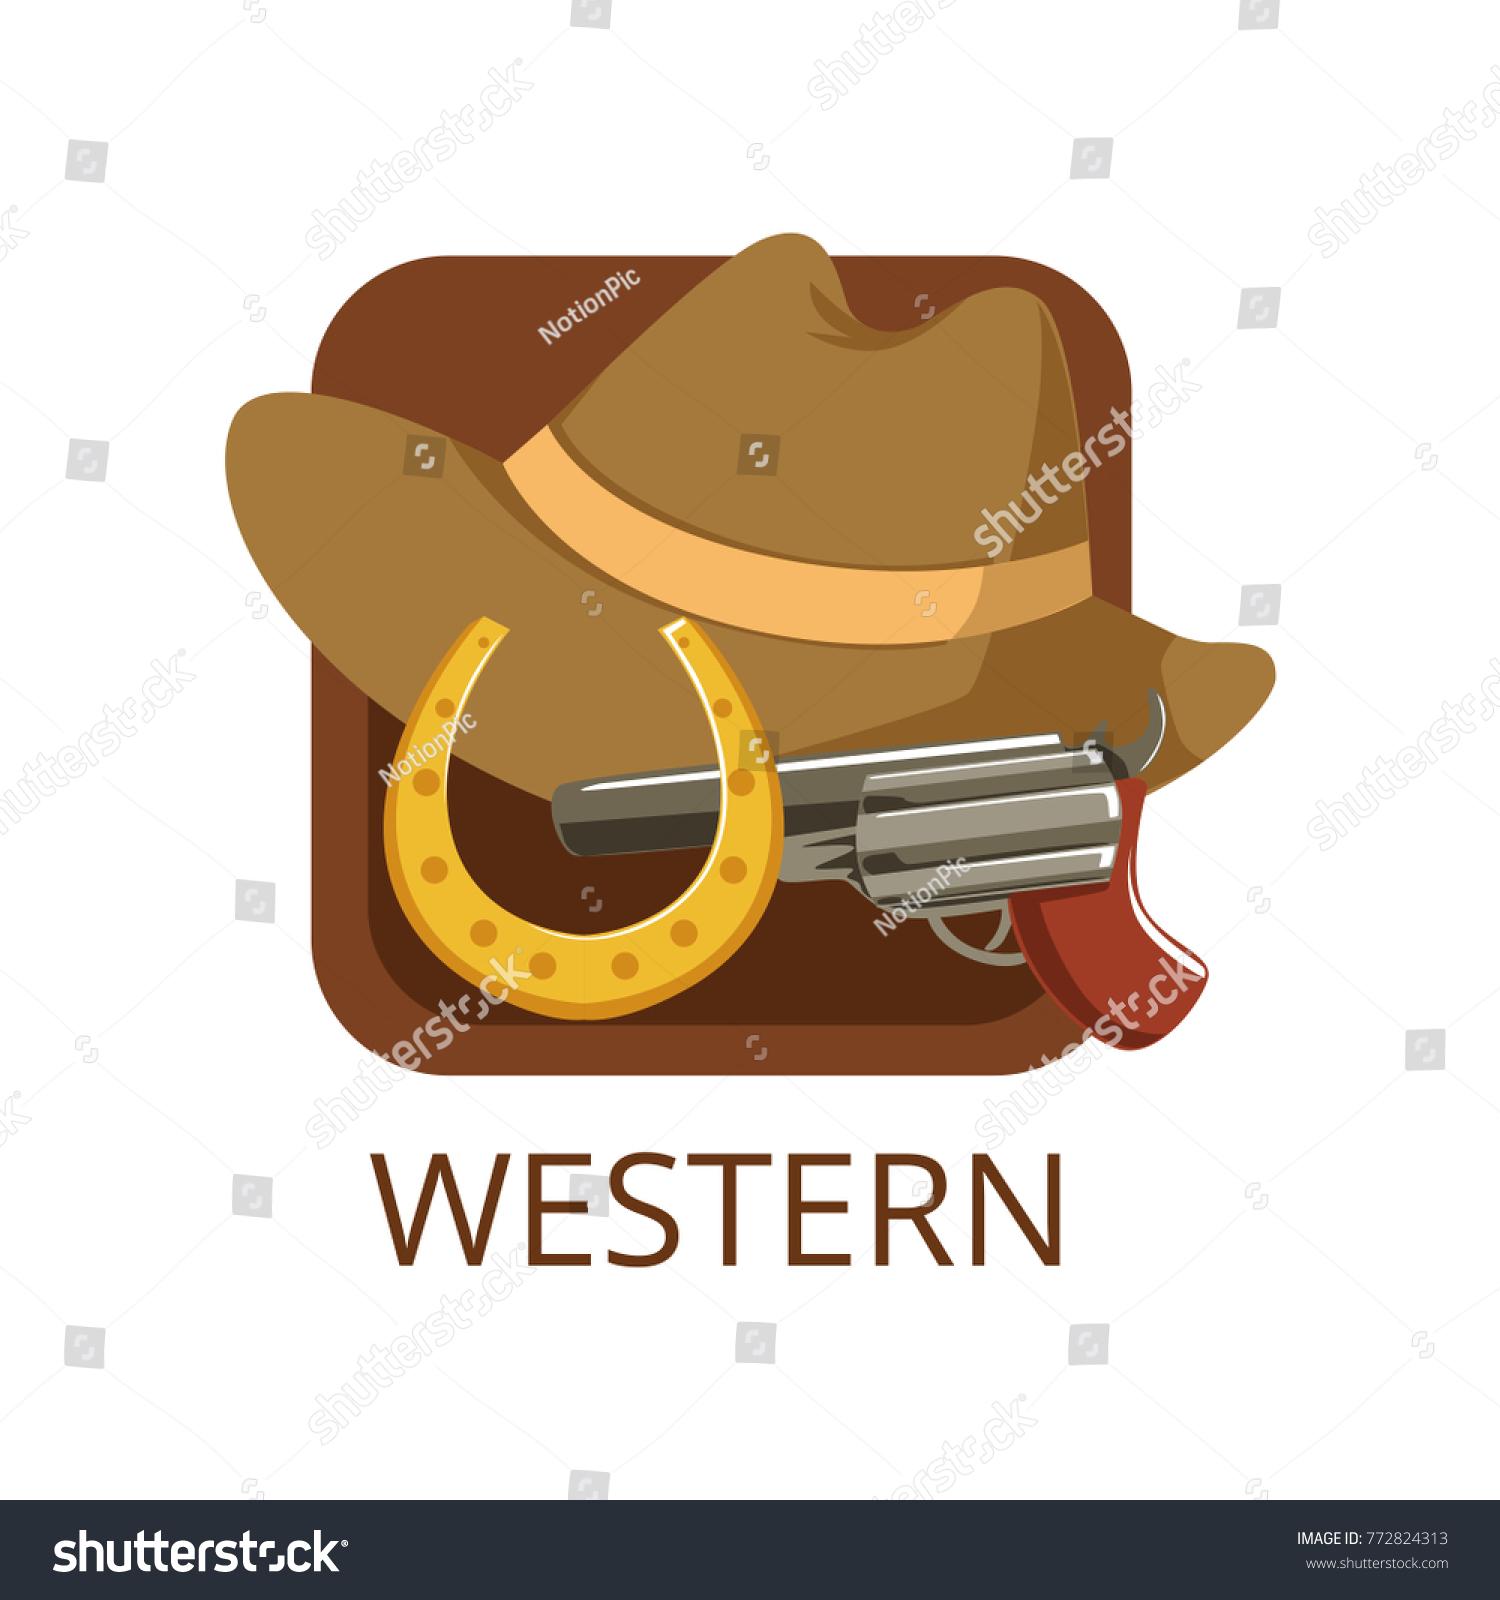 Western cinema genre symbol cinema channel stock vector 772824313 western cinema genre symbol for cinema or channel cinematography movie production vector illustration biocorpaavc